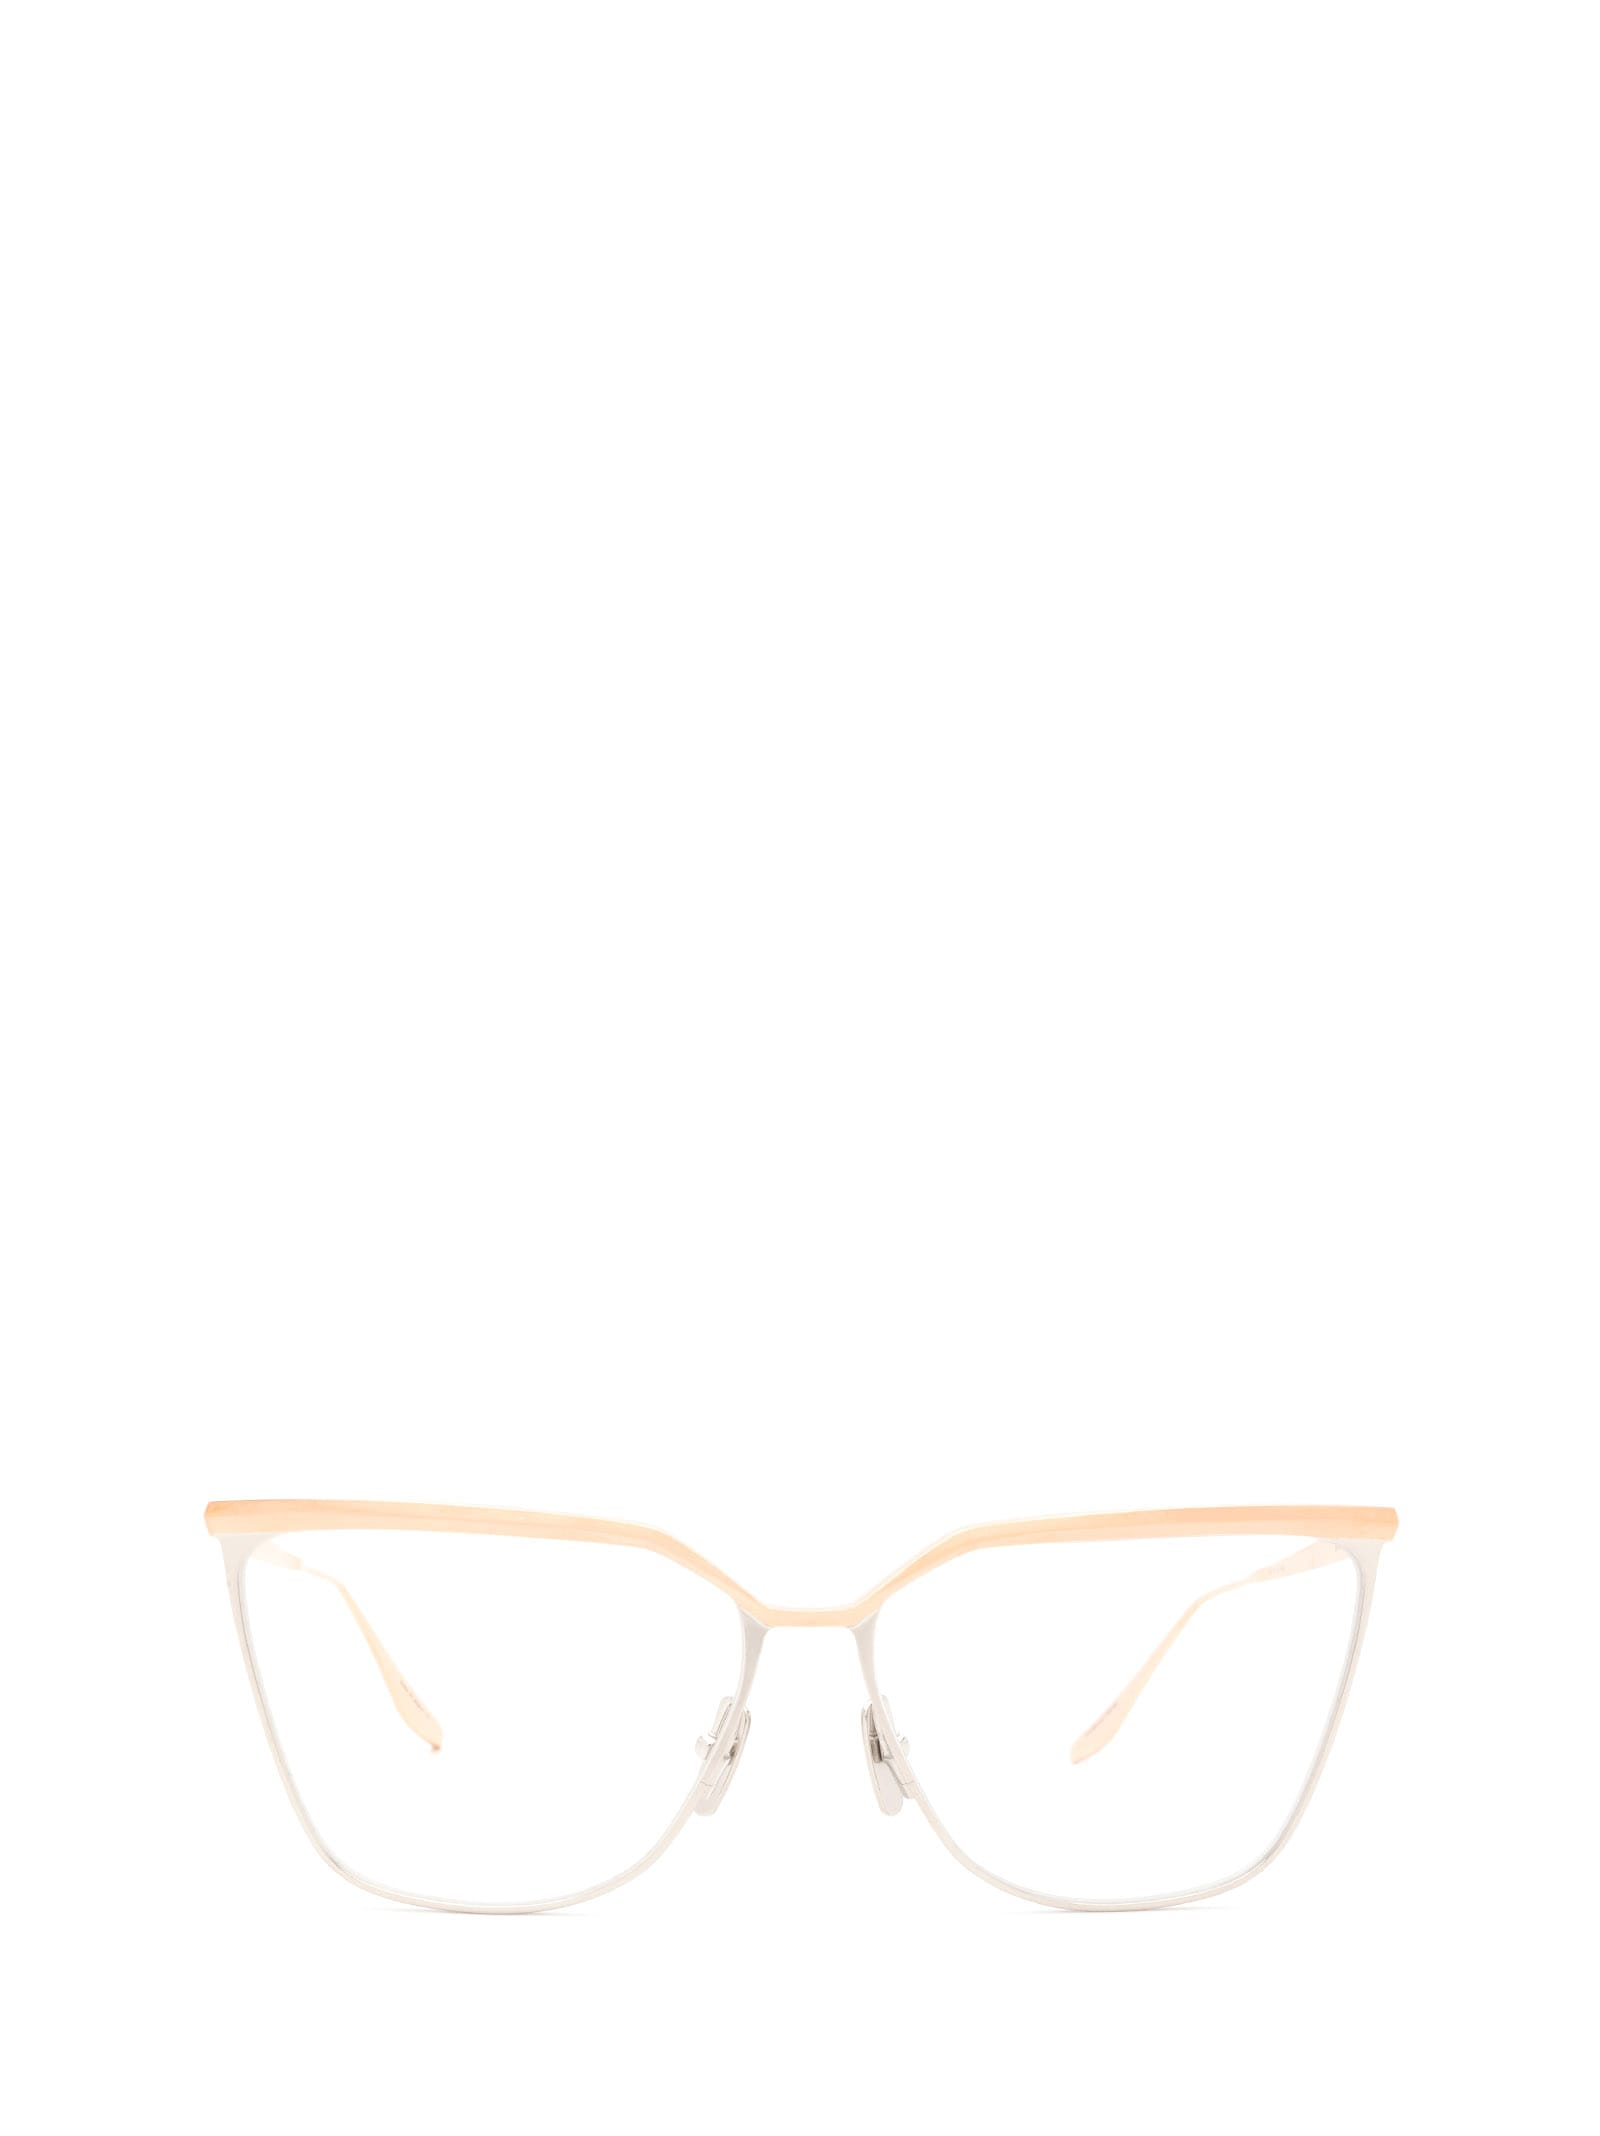 Dita Dita Dtx140-a-02-z Rose Gold & Silver Glasses